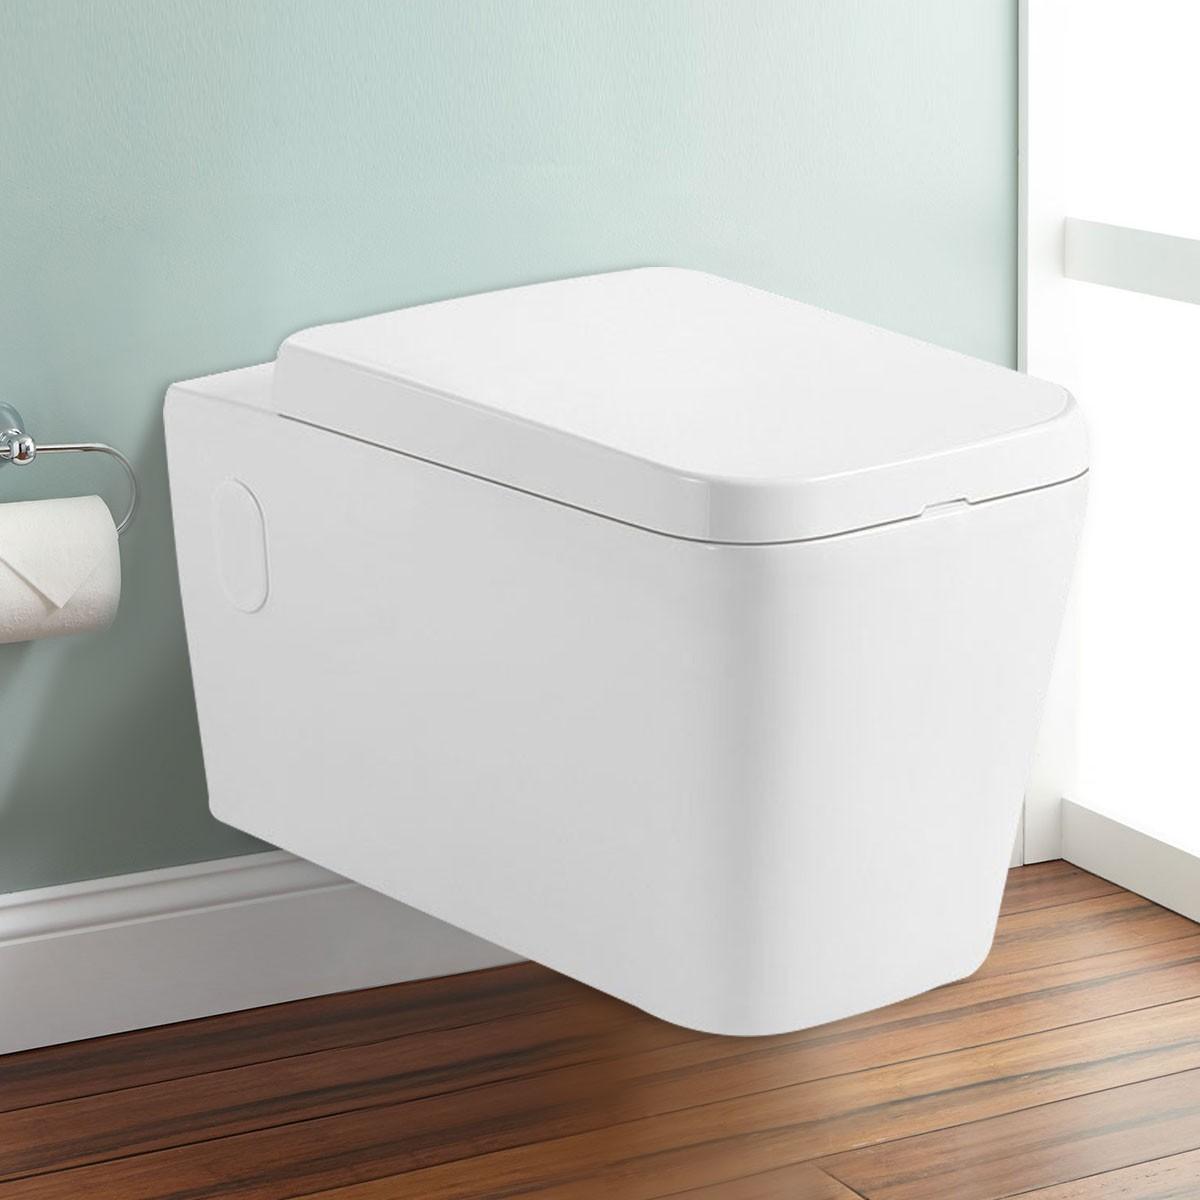 Wall Hung Toilet Bowl - White (DK-ZBQ-11002A)